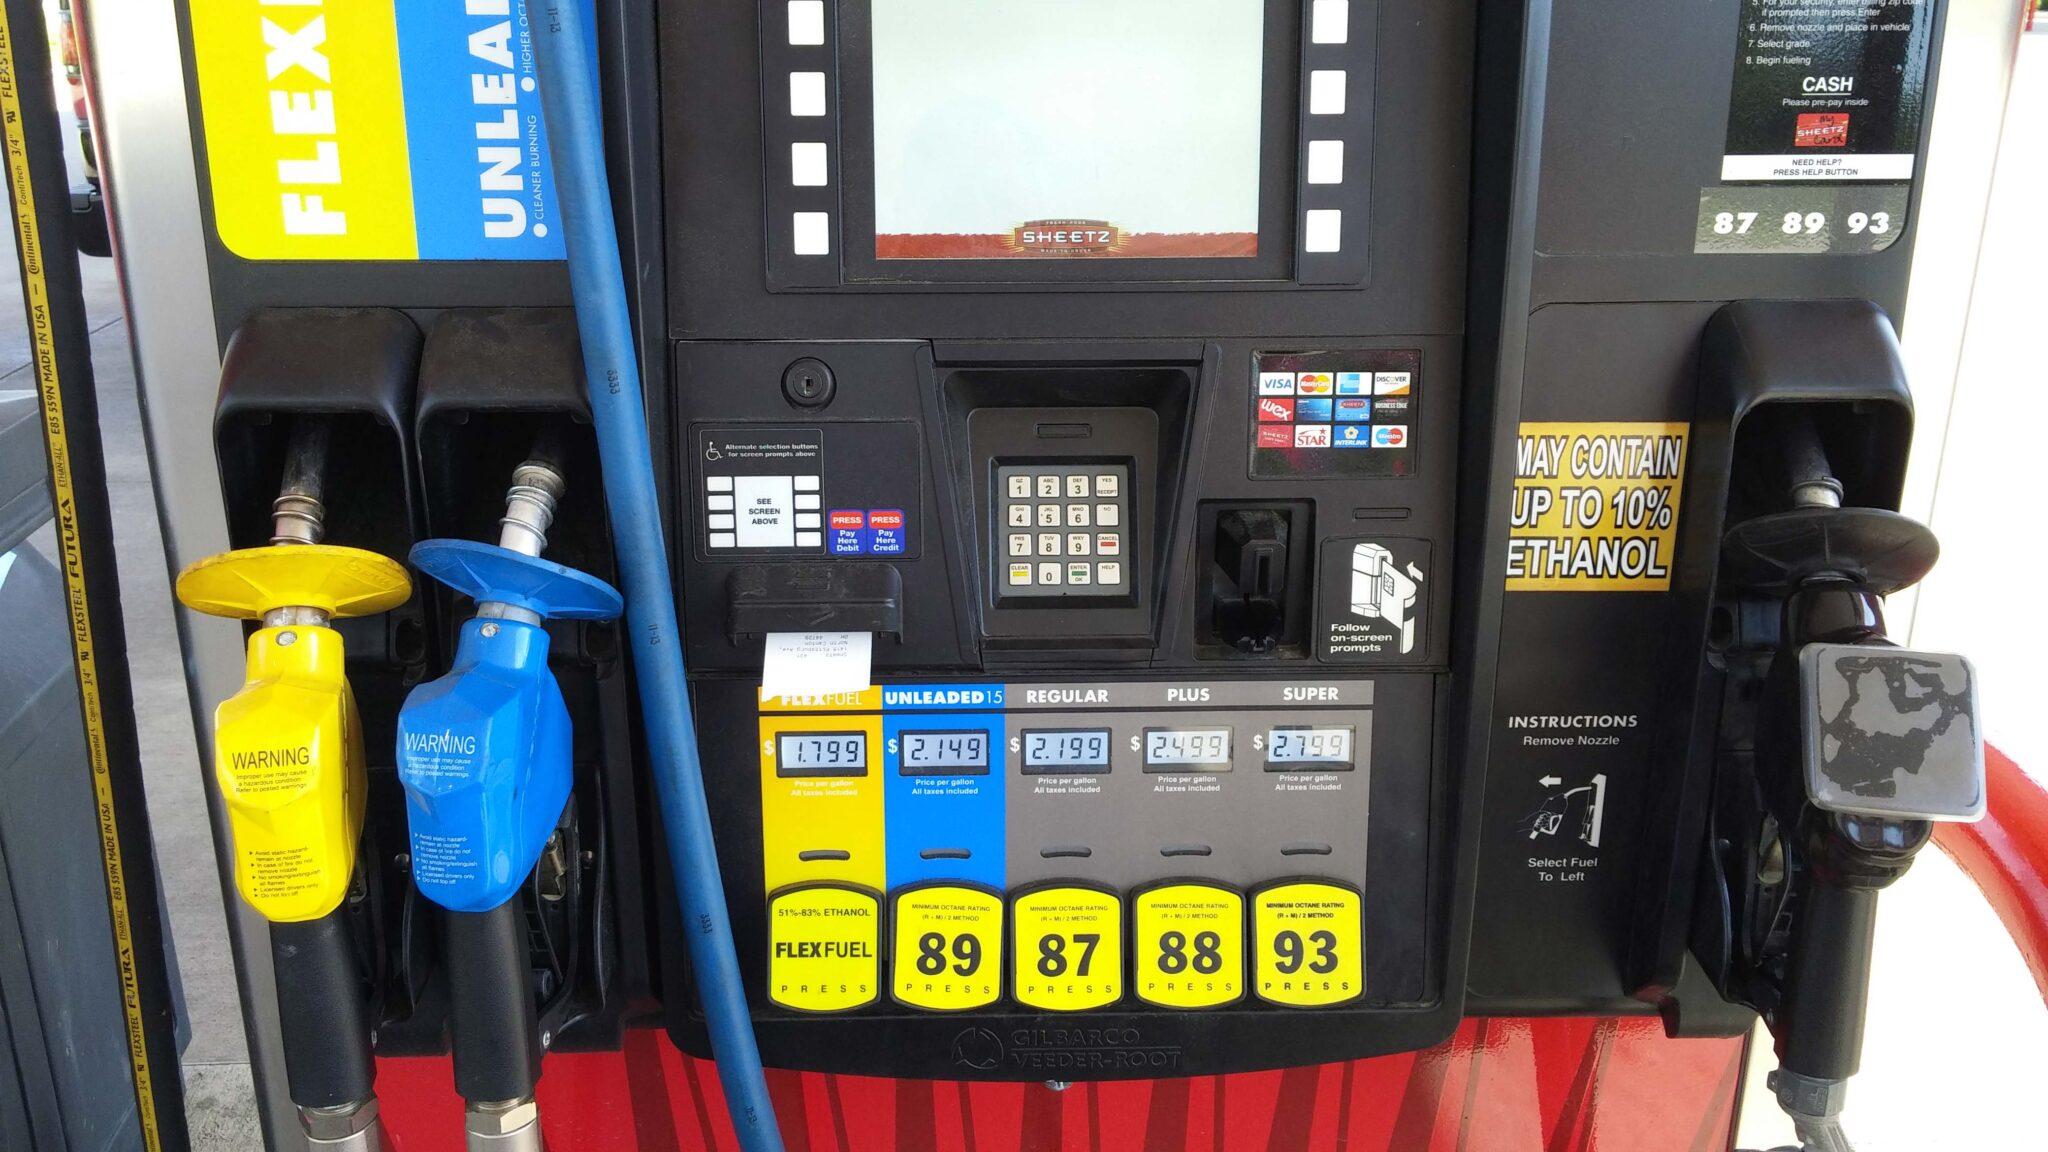 Ethanol input